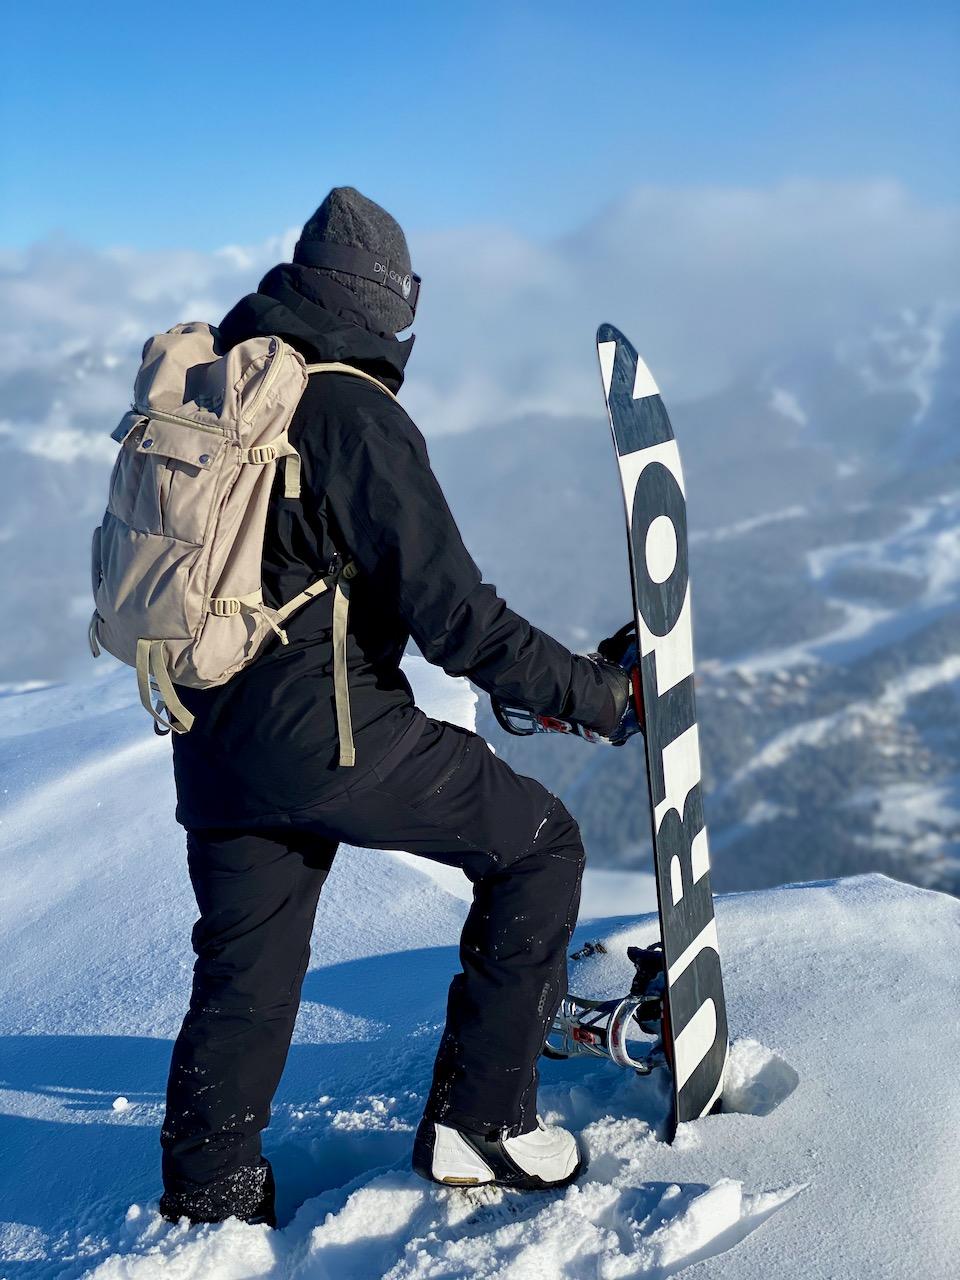 Burton 'Nug' Snowboard, Méribel